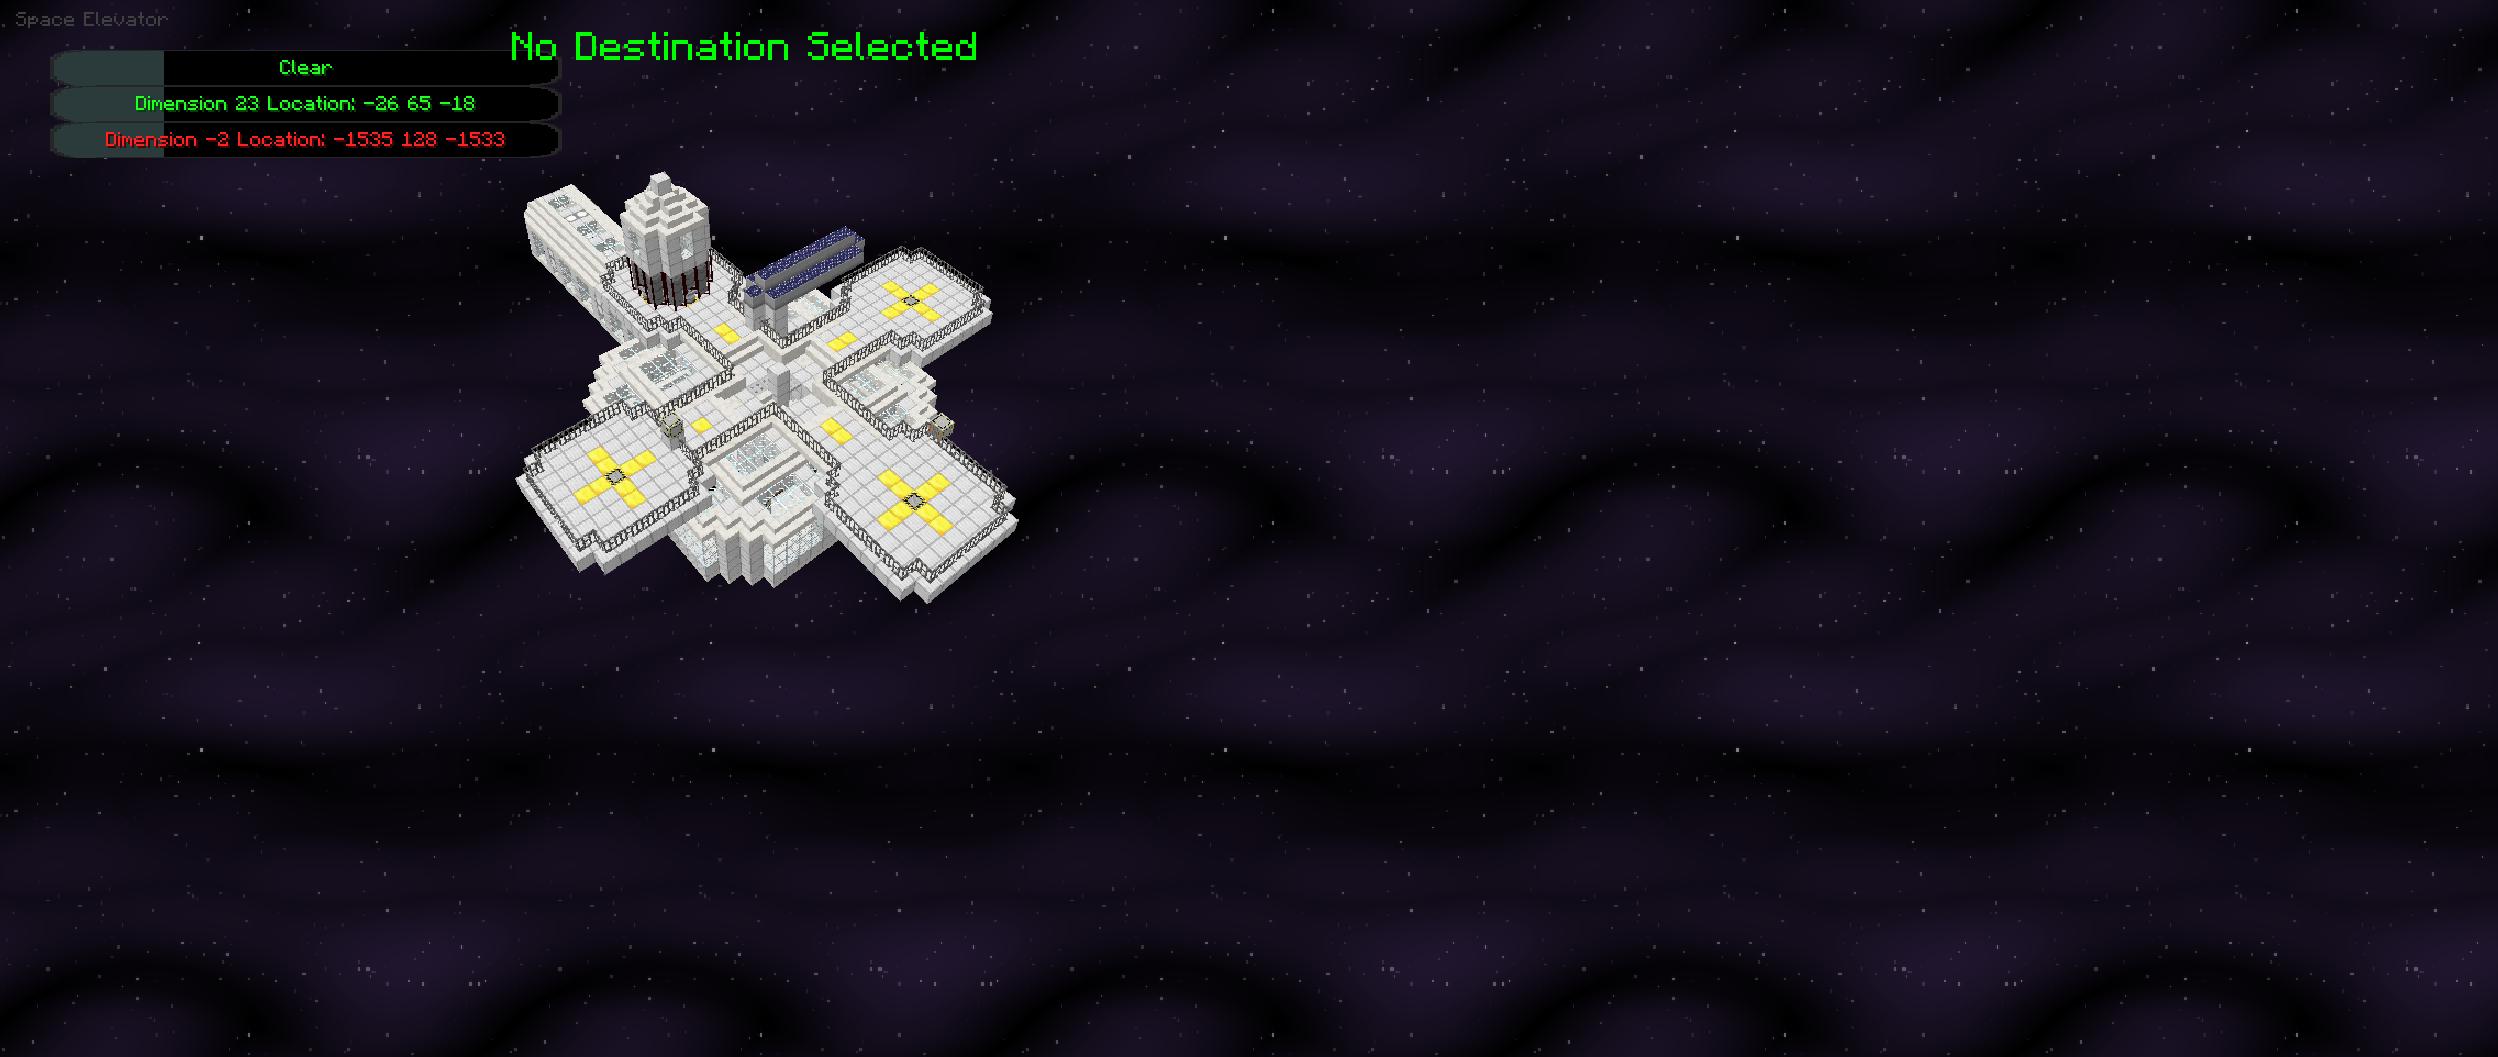 Space Elevator won't let me select valid destination